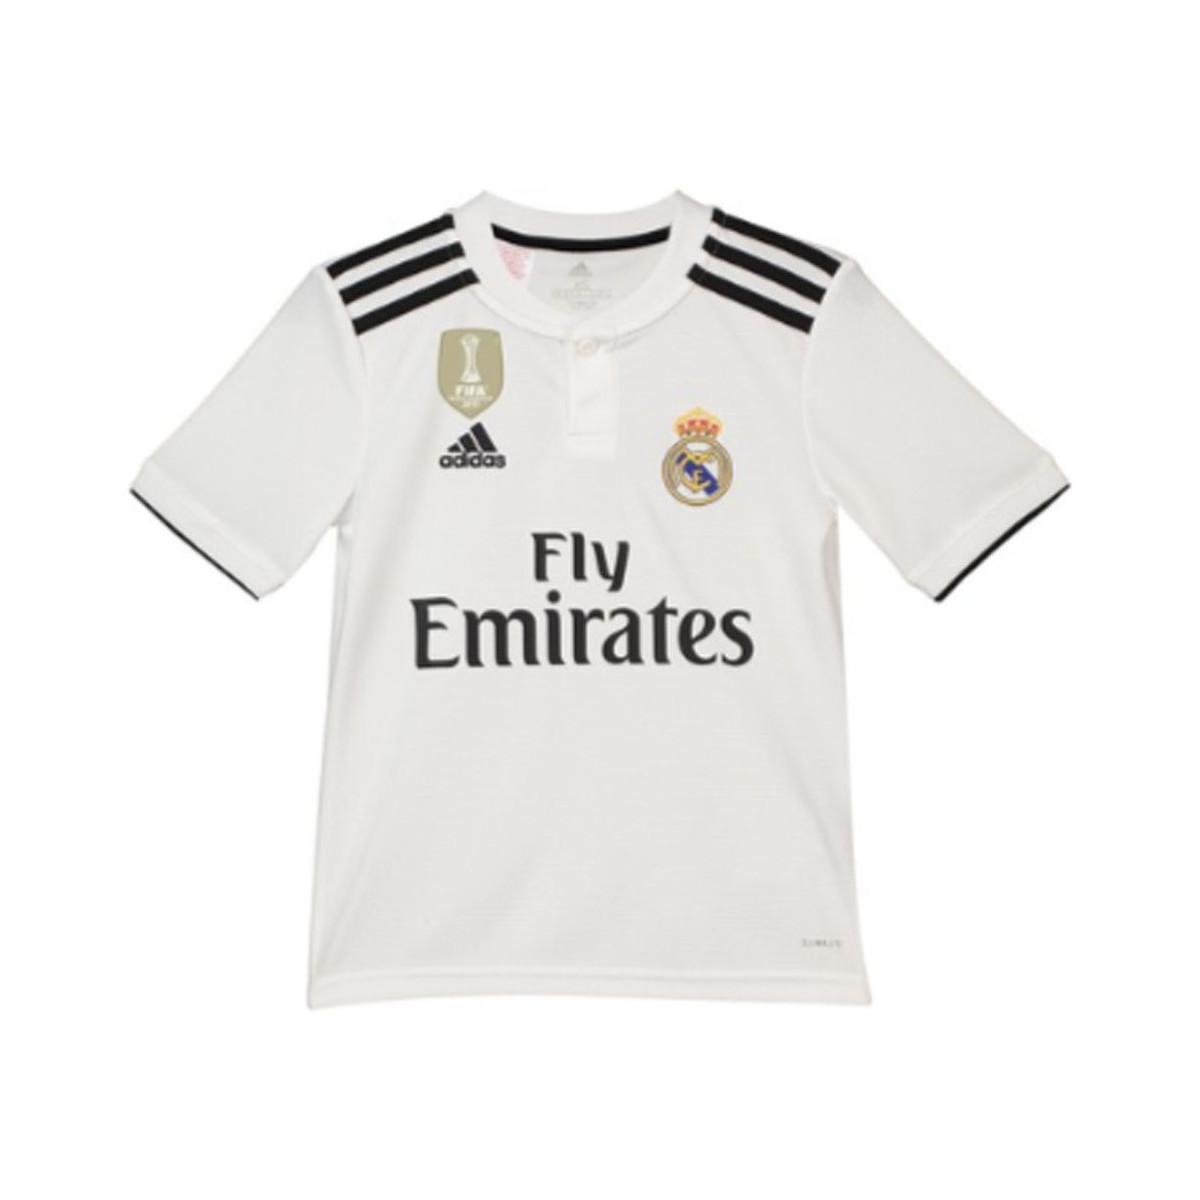 18d43d8fec3 Adidas - 2018-19 Real Madrid Home Football Shirt (bale 11) - Kids. View  fullscreen